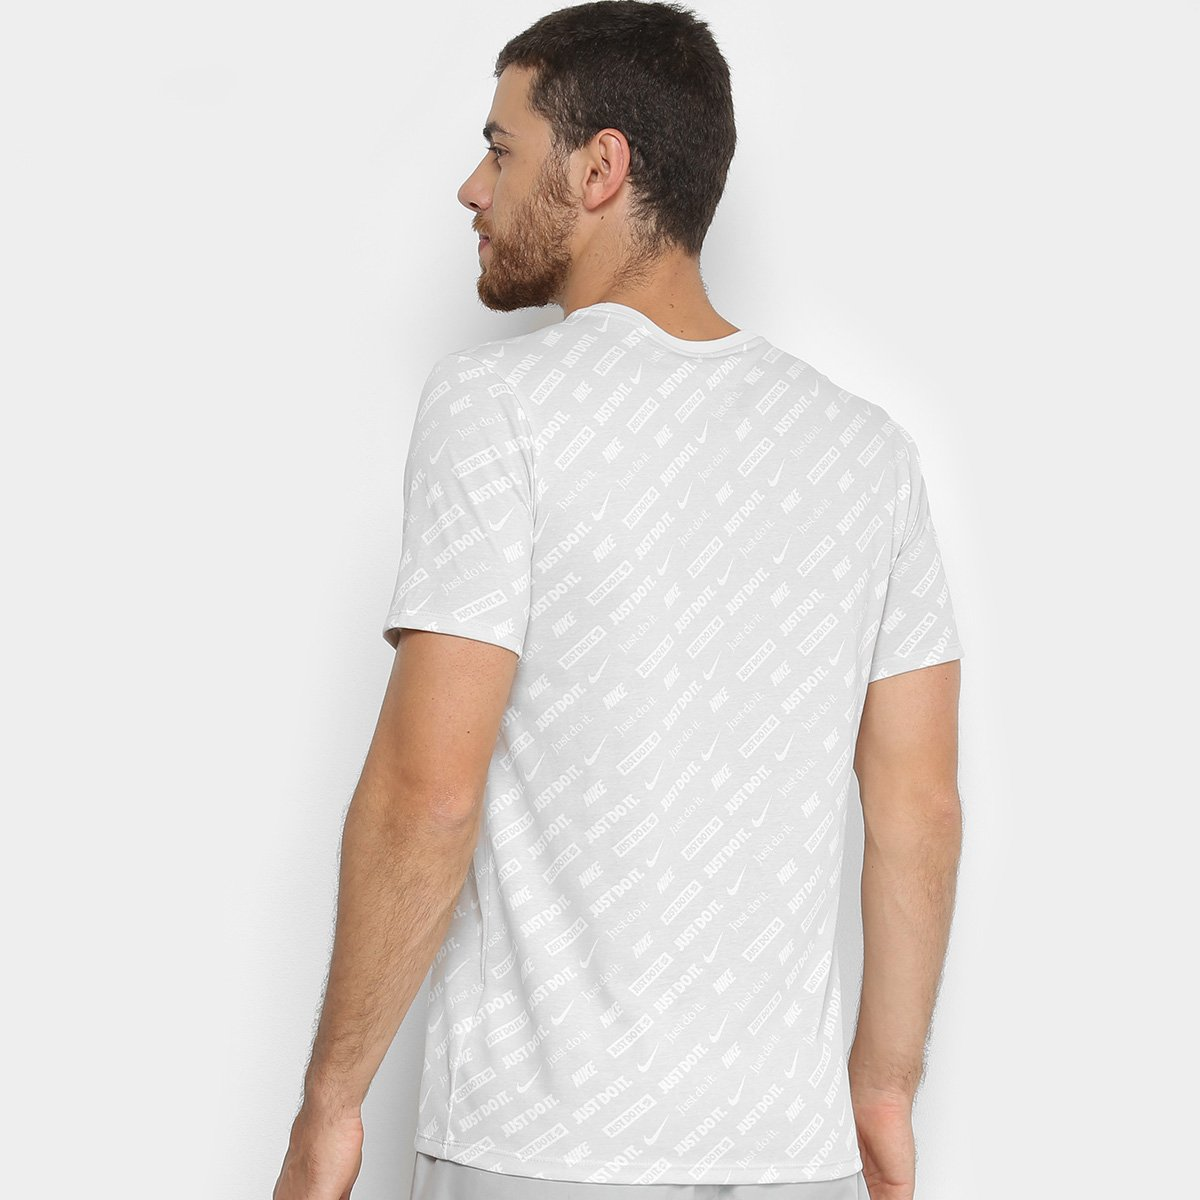 afd2c1829f Camiseta Nike Dri-Fit Masculina - Cinza e Branco - Compre Agora ...